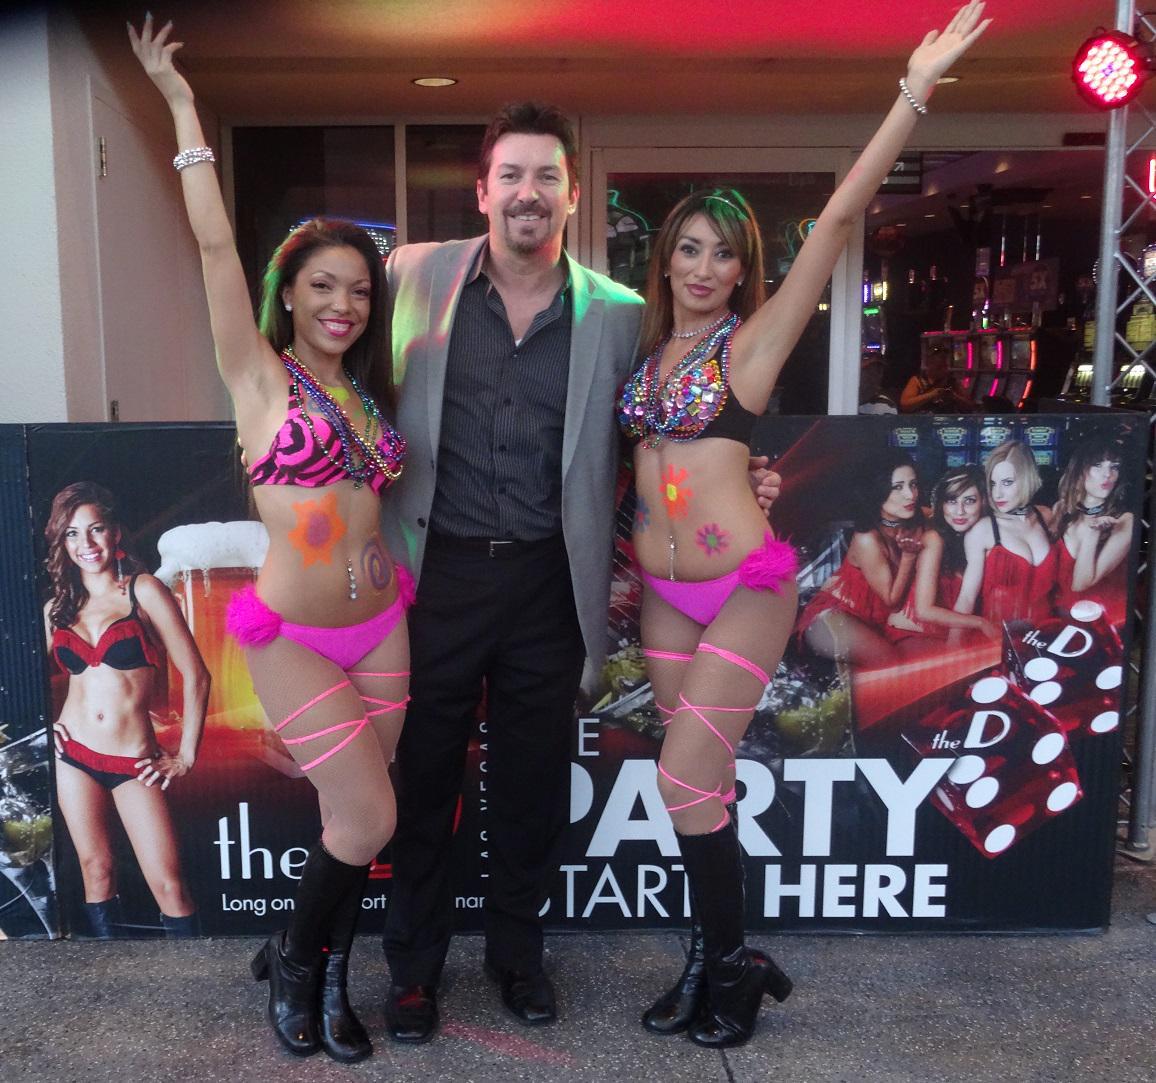 Working @theDlasvegas is rough with my sexy, fellow employees around! #EDCLV #Vegas #Party @FSELV http://t.co/kBWkTpXBhR